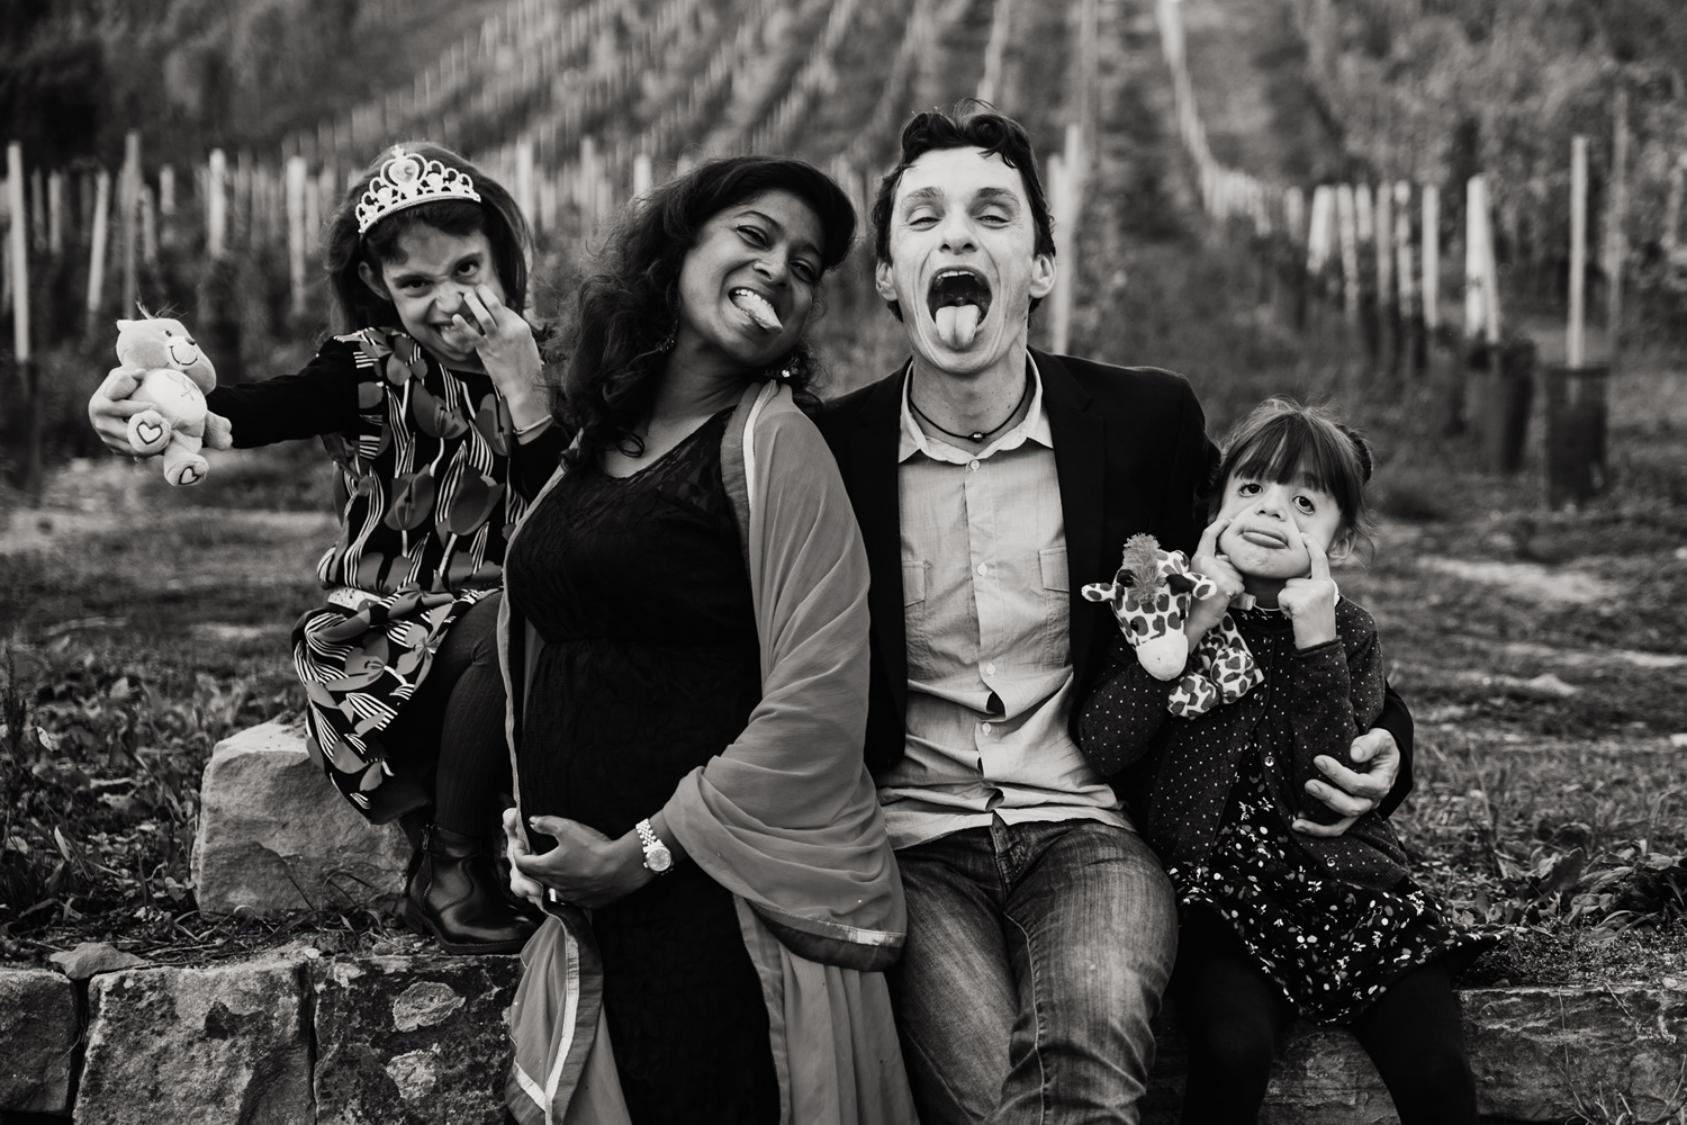 Photographe Grossesse Mulhouse - Photographe Grossesse Colmar - Photographe Grossesse Haut-Rhin - Photographe Grossesse Alsace - Photographe bébé Mulhouse – Photographe bébé Haut-Rhin - Photographe Nouveau né Mulhouse - Photographe Mulhouse Bertrand DISDIER